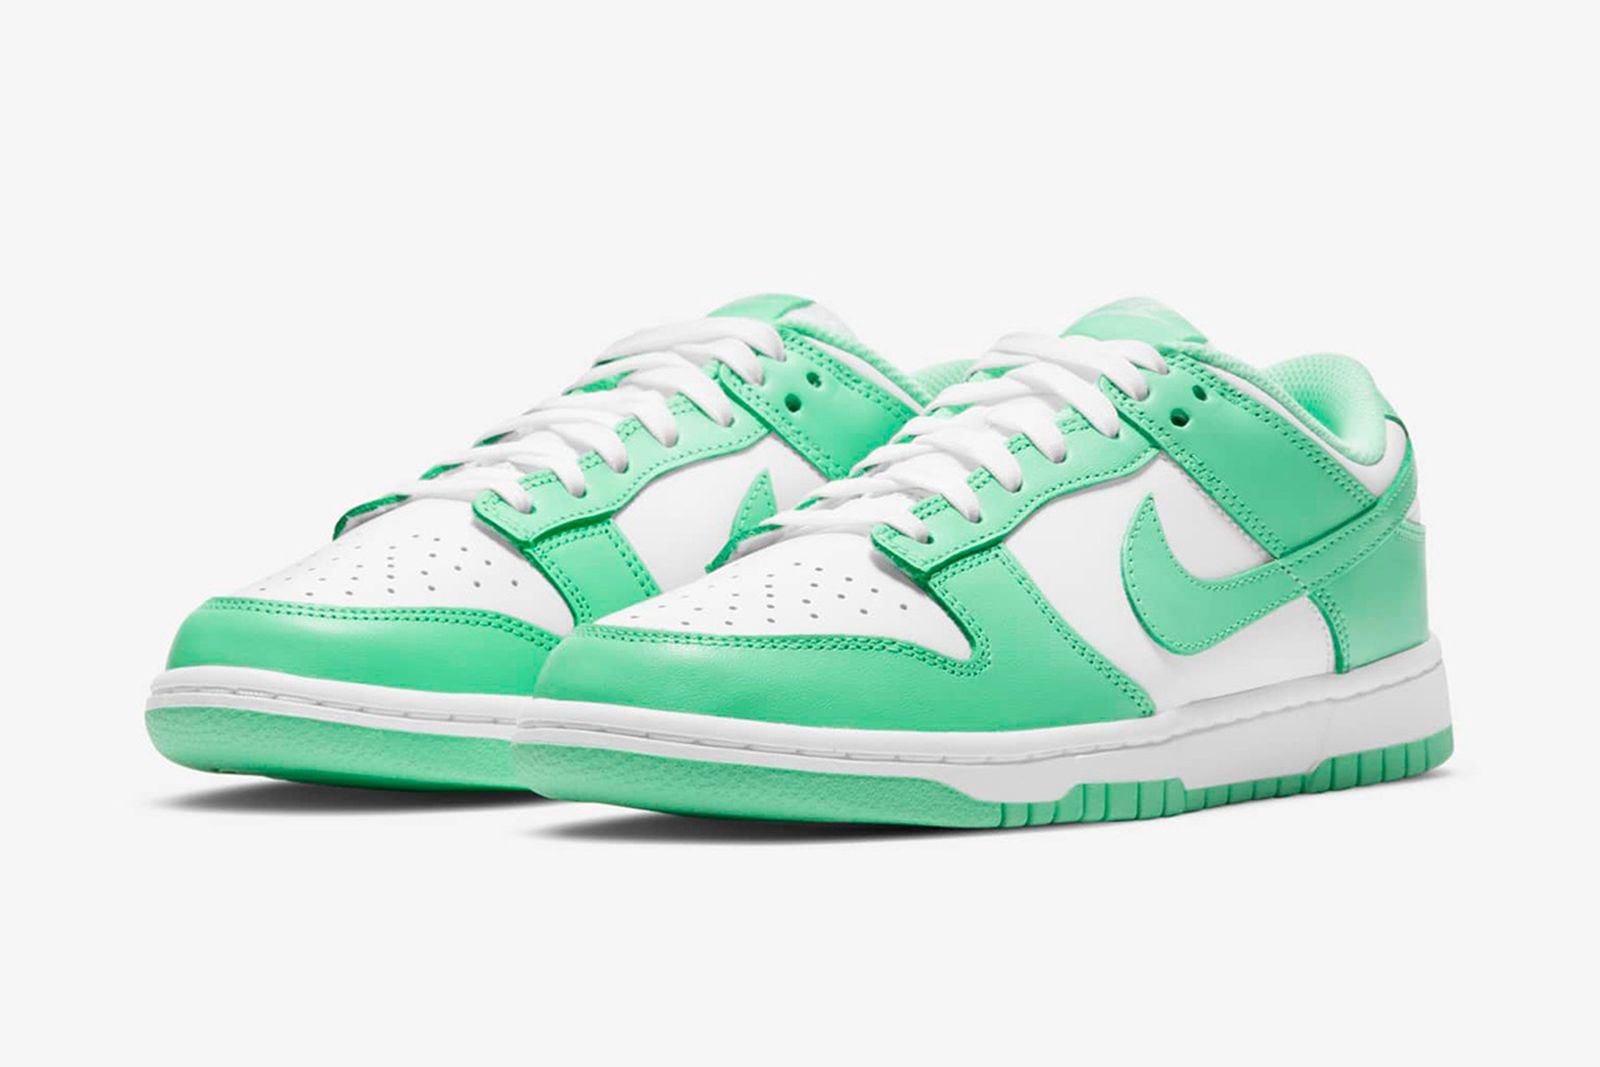 nike-dunk-low-green-glow-release-date-price-01